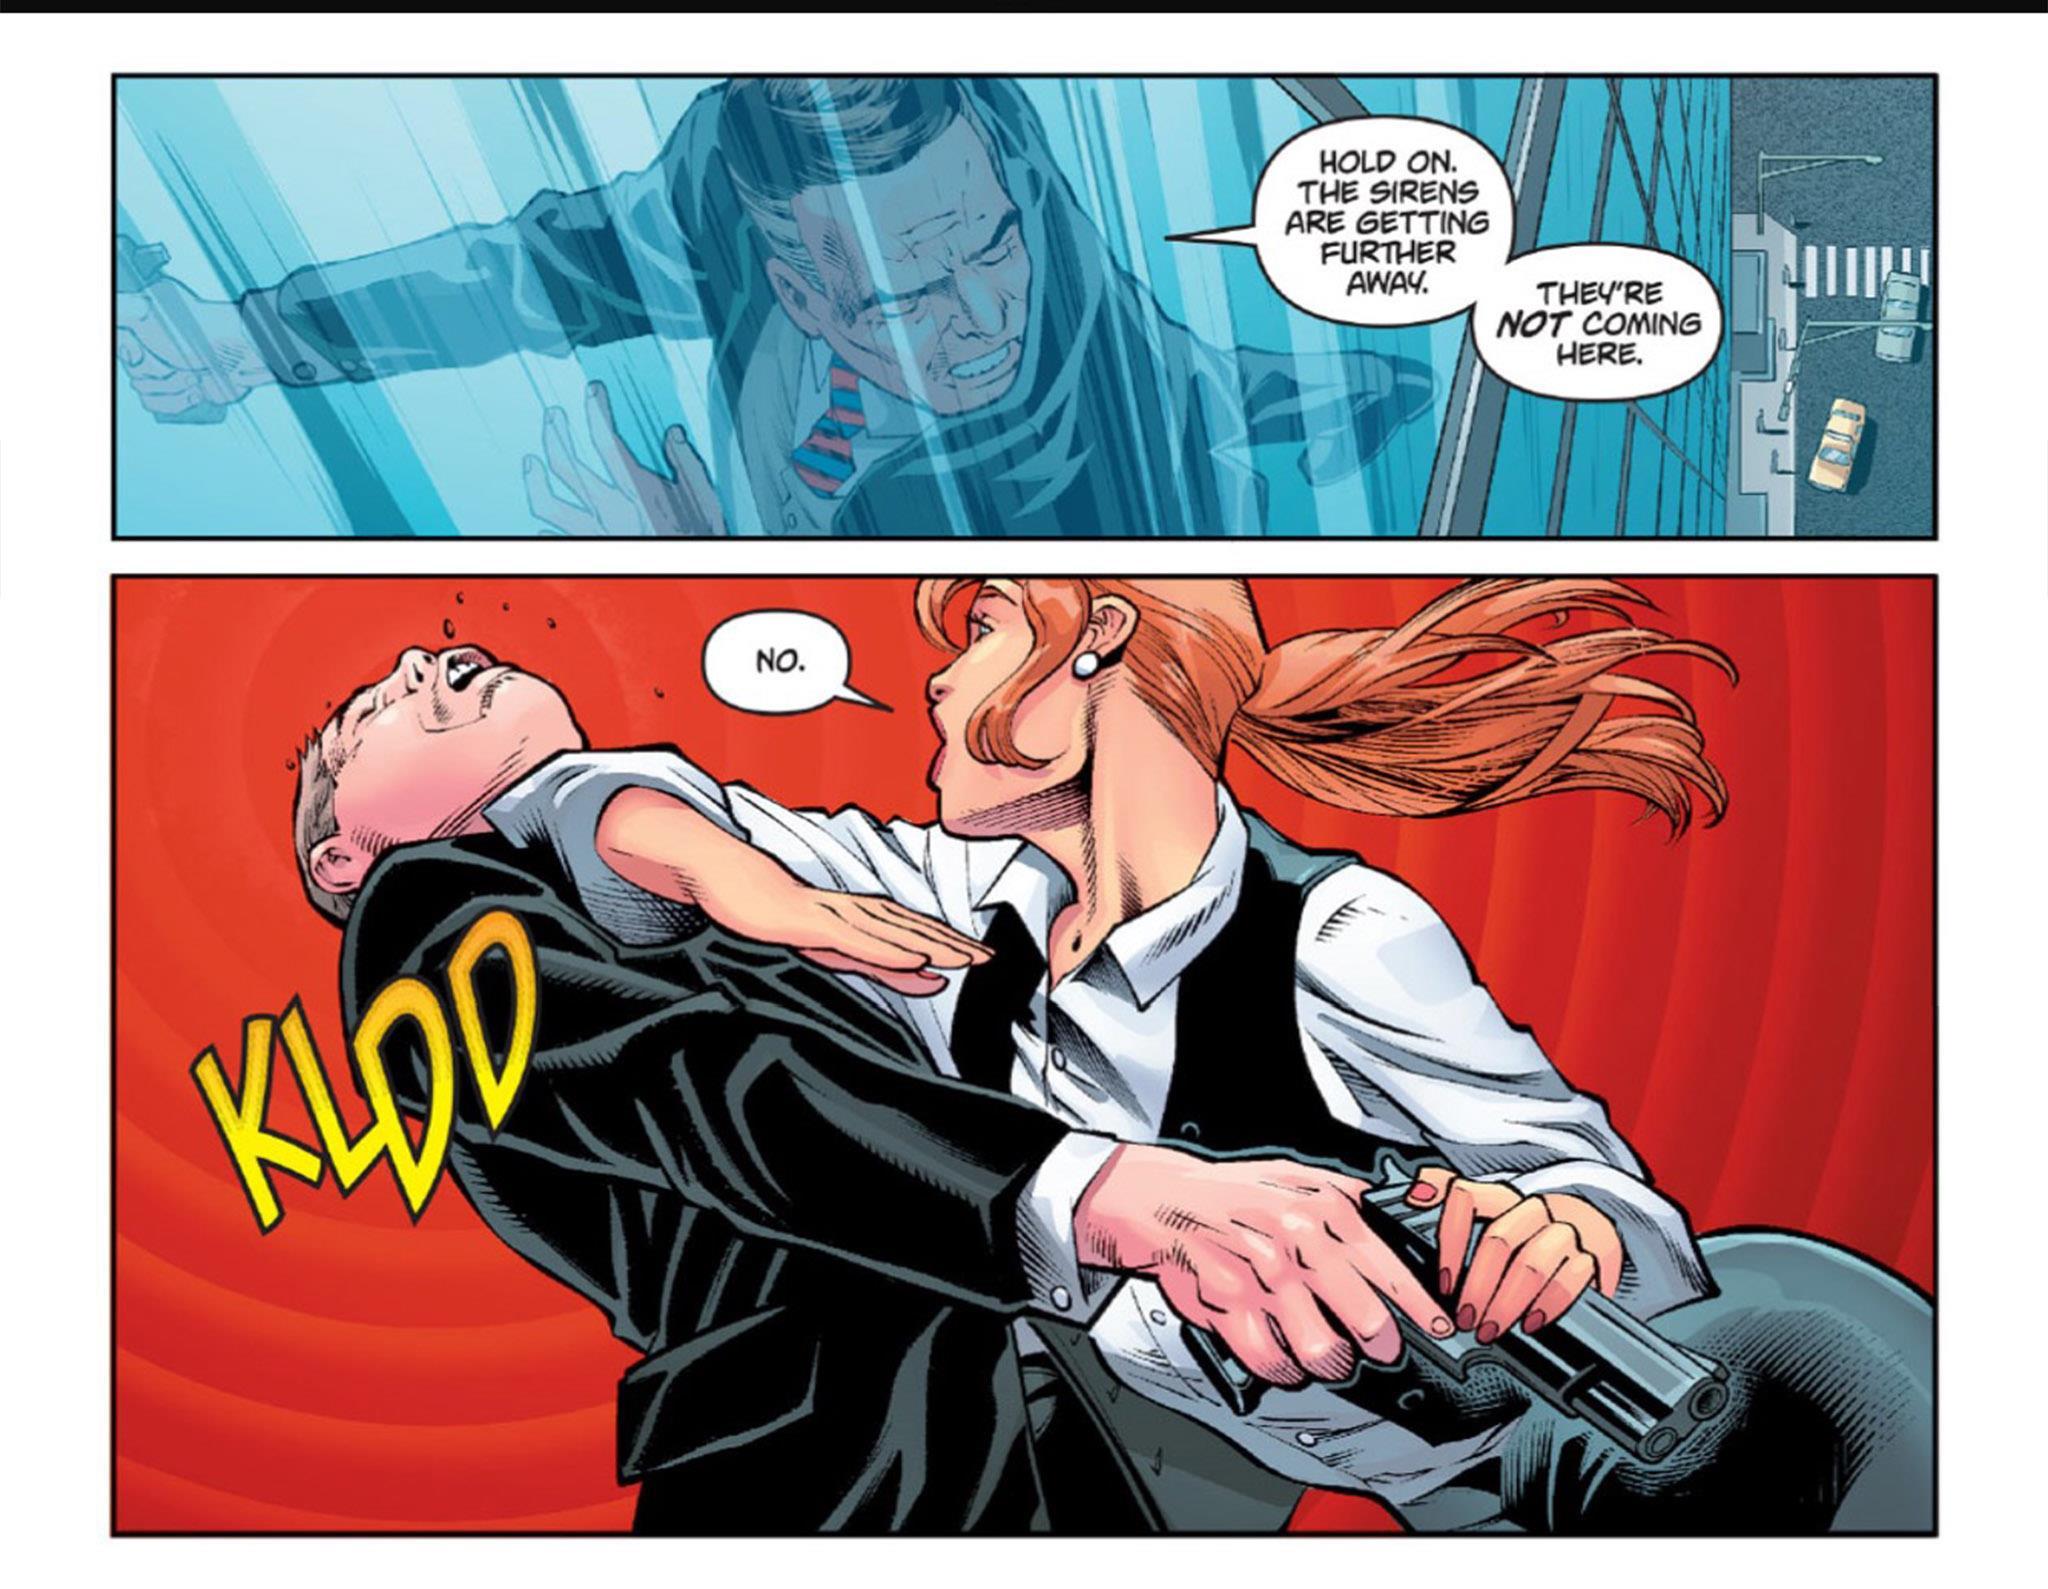 batman_v_superman_dawn_of_justice_chapter_featuring_lois_lane_2_2016_oldal_15.jpg